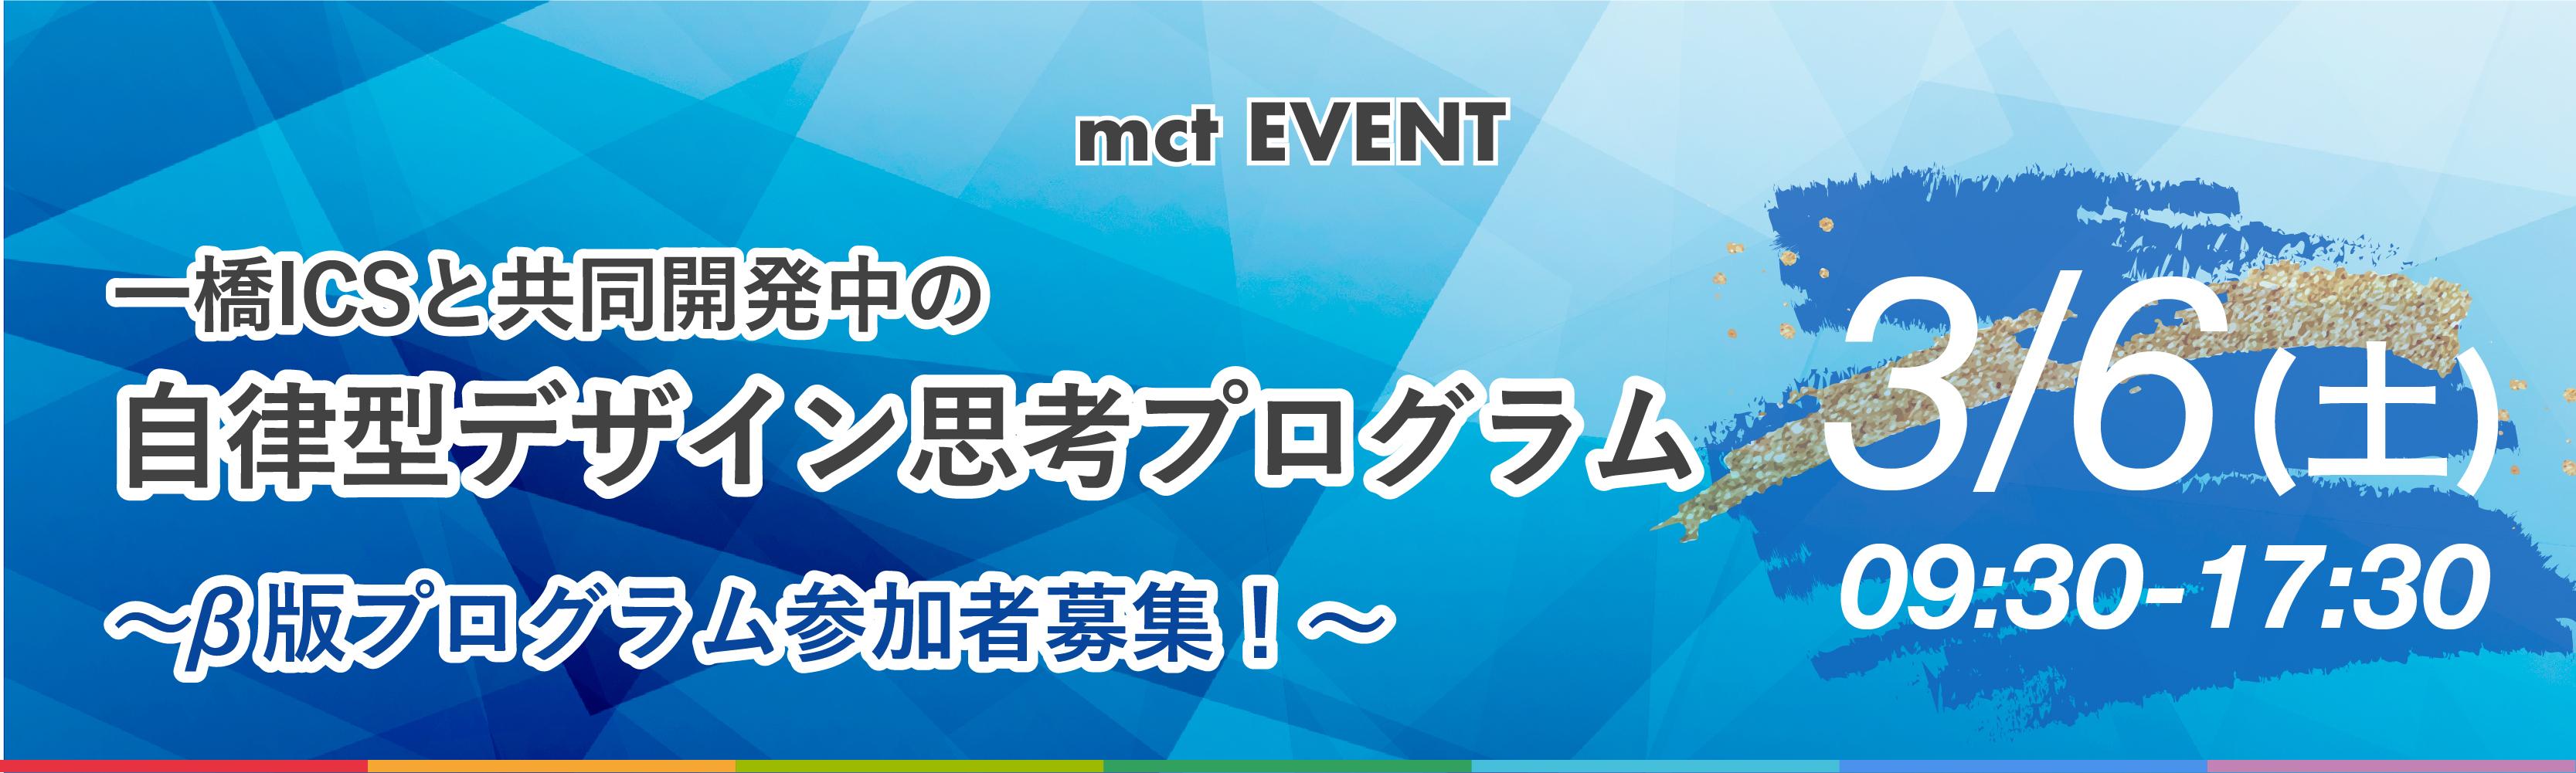 EVENT|β版プログラム参加者募集!一橋ICSと共同開発中の自律型デザイン思考プログラム